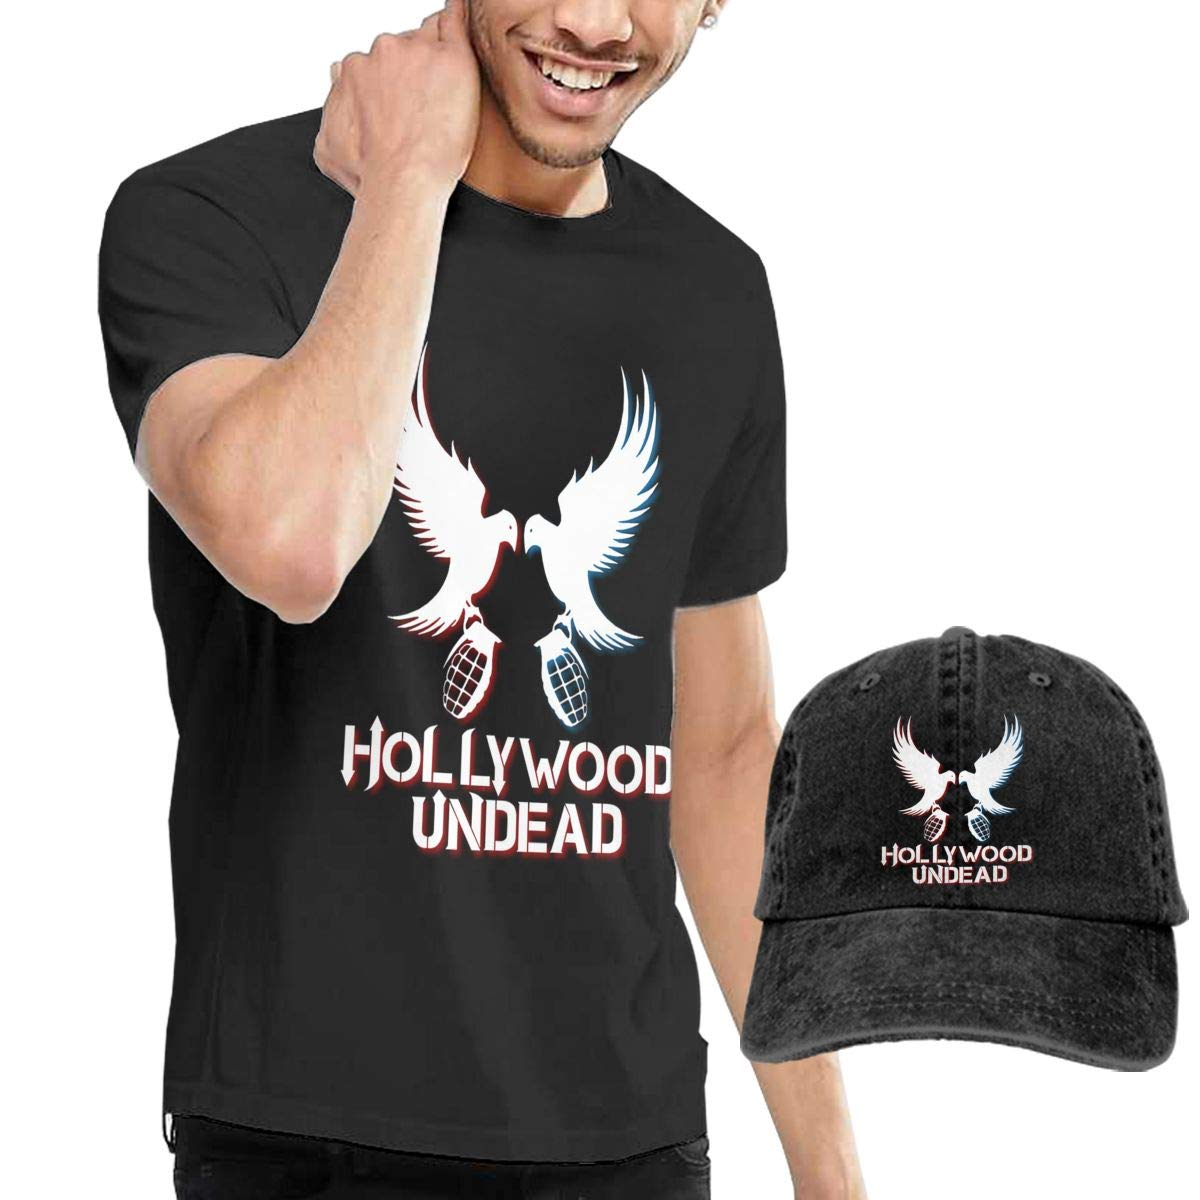 Hfusih.fhs6f789 Hollywood Undead Adult Cap Adjustable Cowboys Hats Baseball Cap